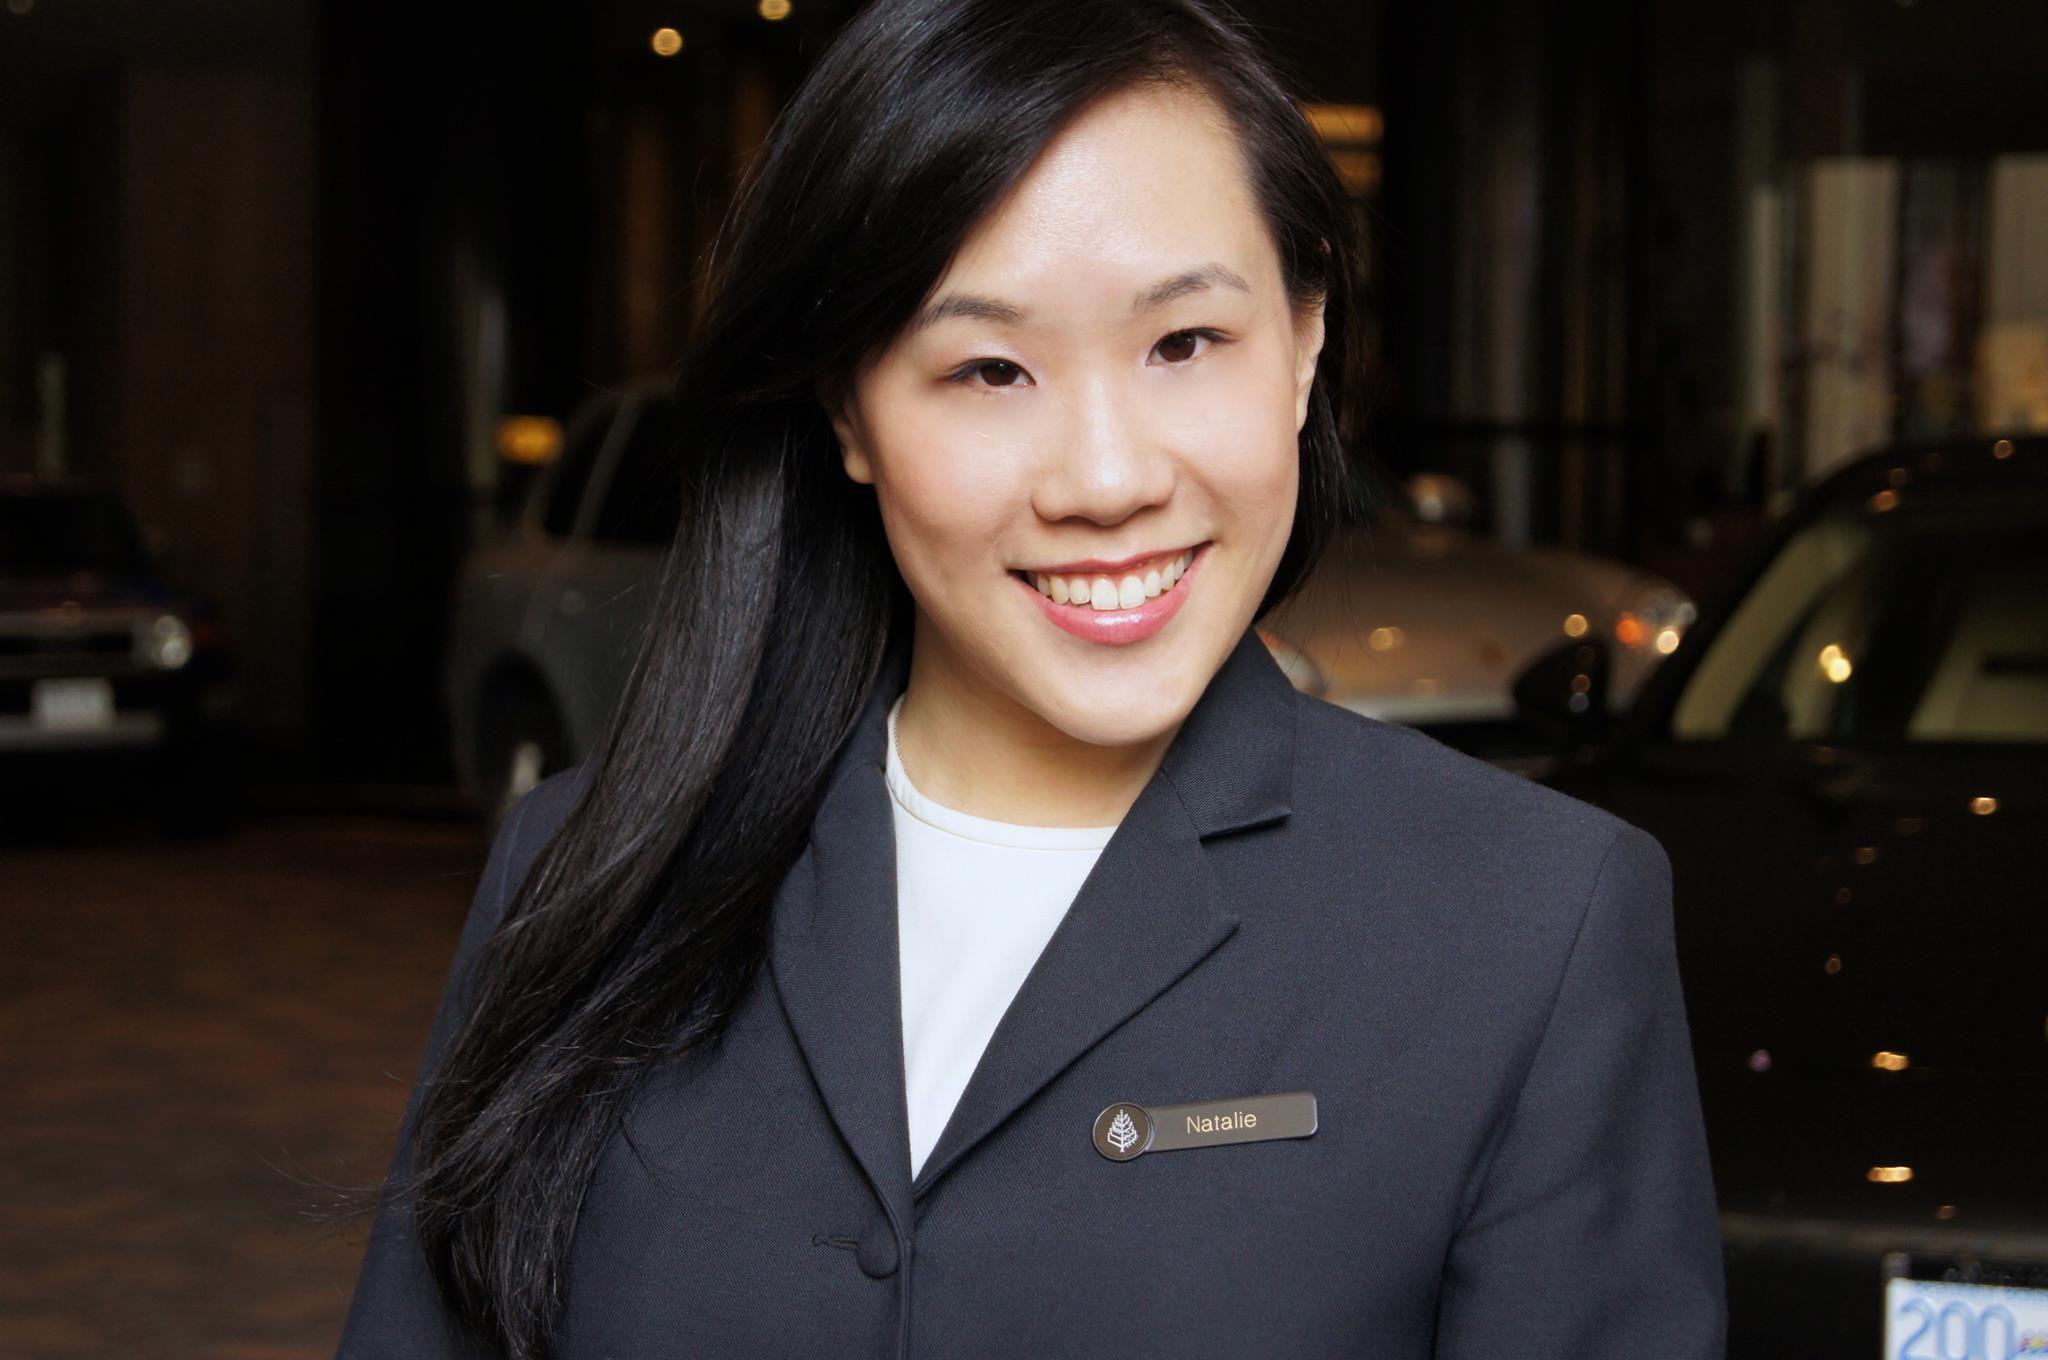 Hotel Front Desk Agent Resume Best Of Front Fice Agent Resume Samples In 2020 Front Desk Agent Front Desk Hotel Job Resume Samples